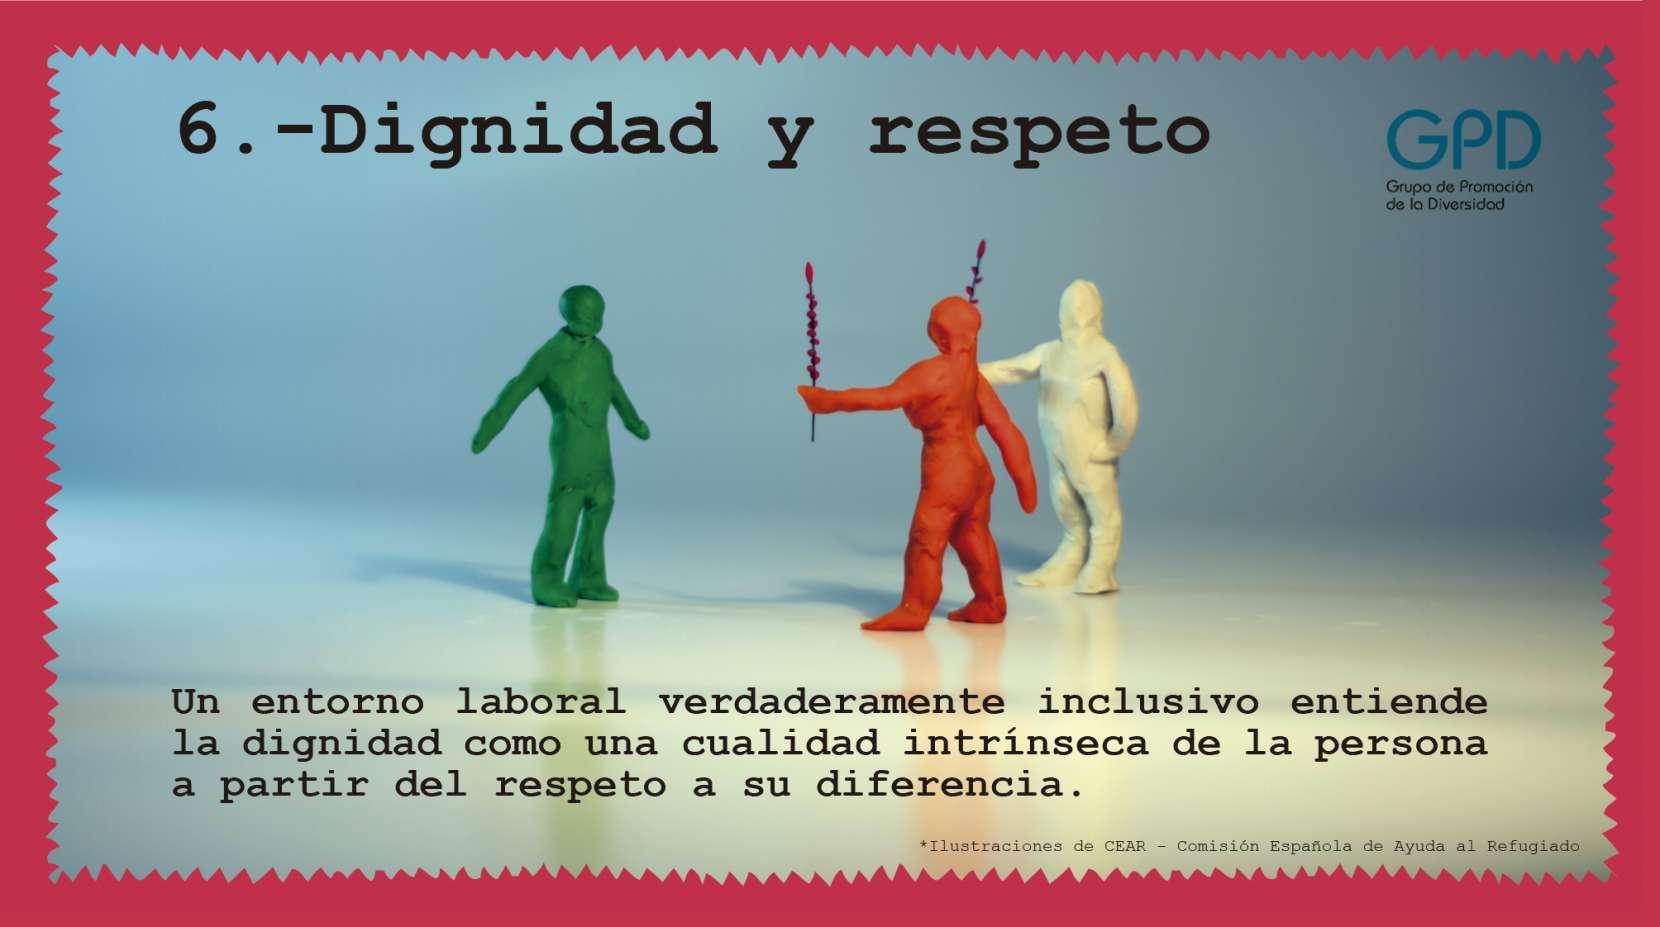 decalogo_con_logo_leyenda-08-1660x927.jpg